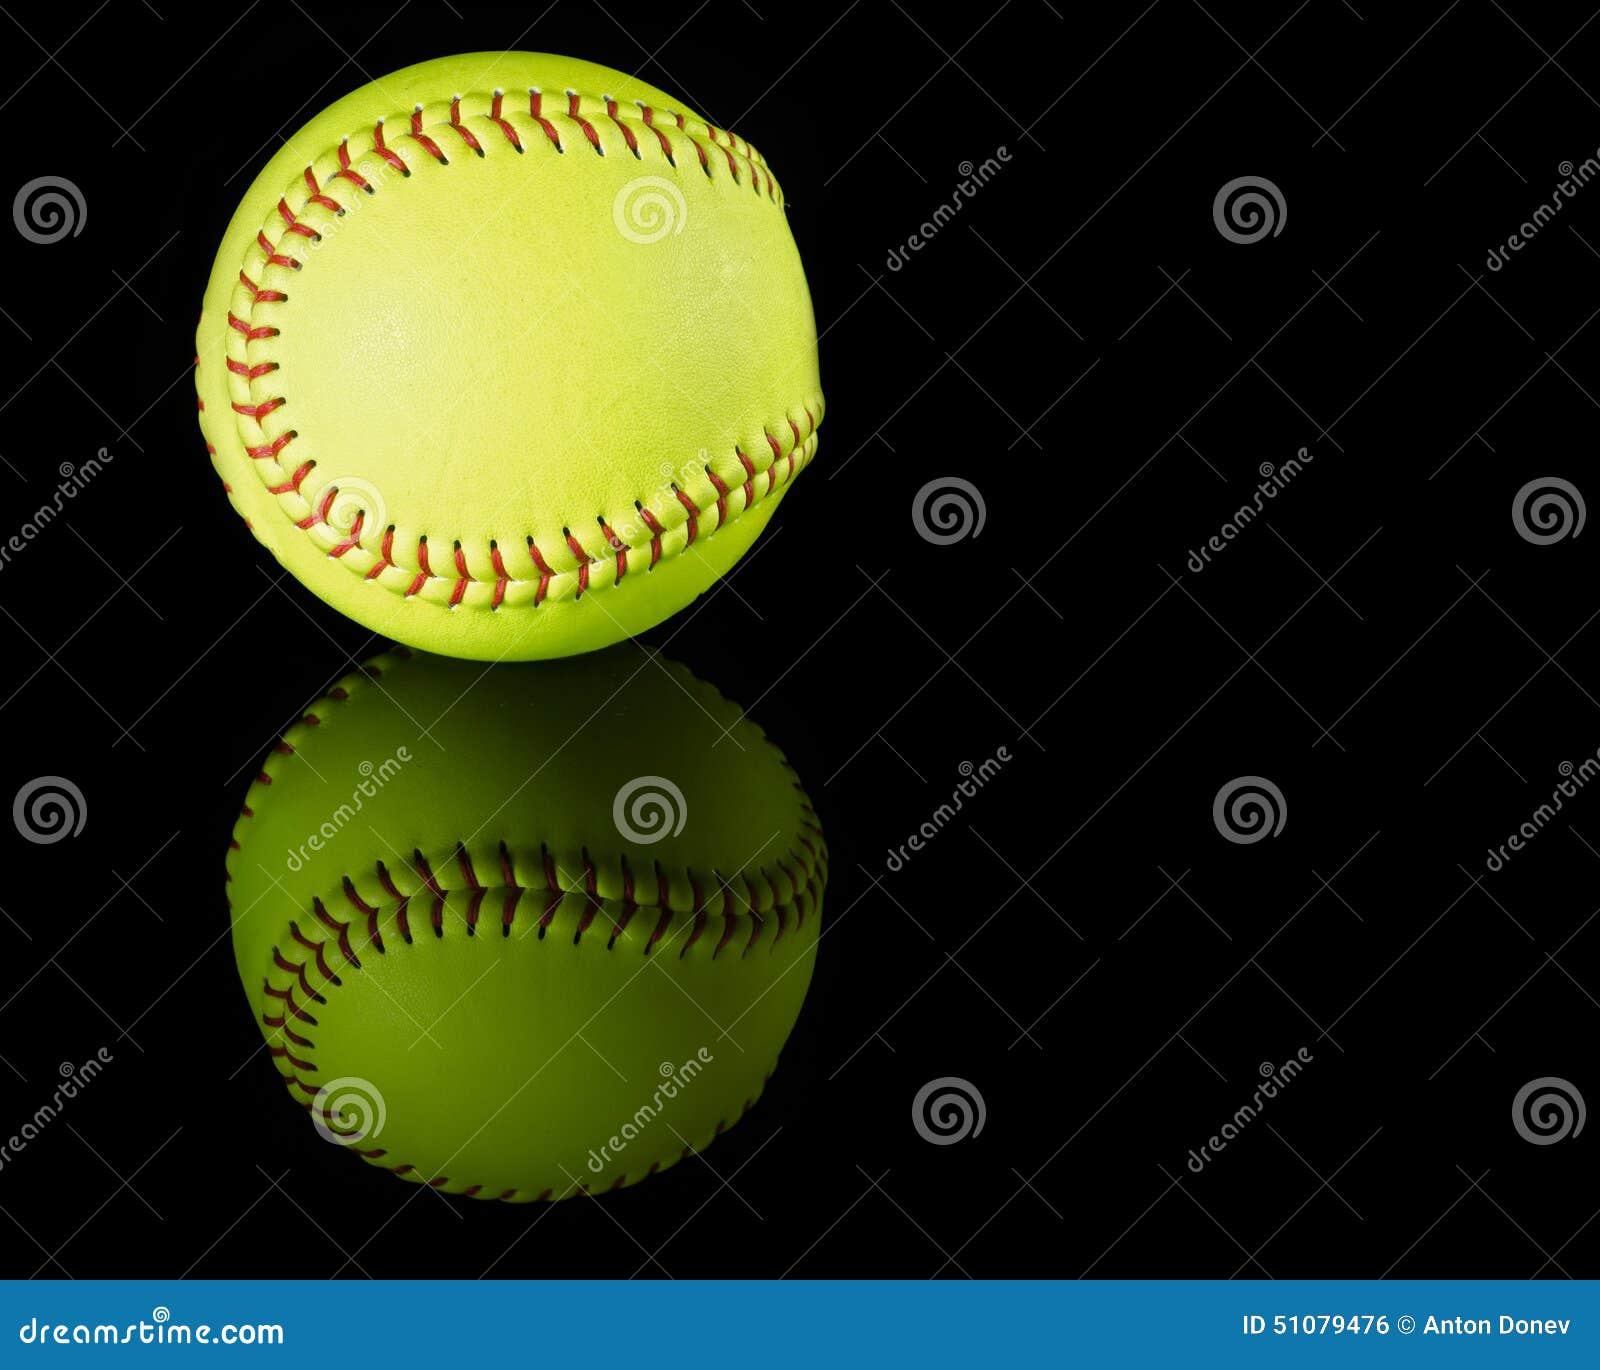 softball on black reflective background stock photo